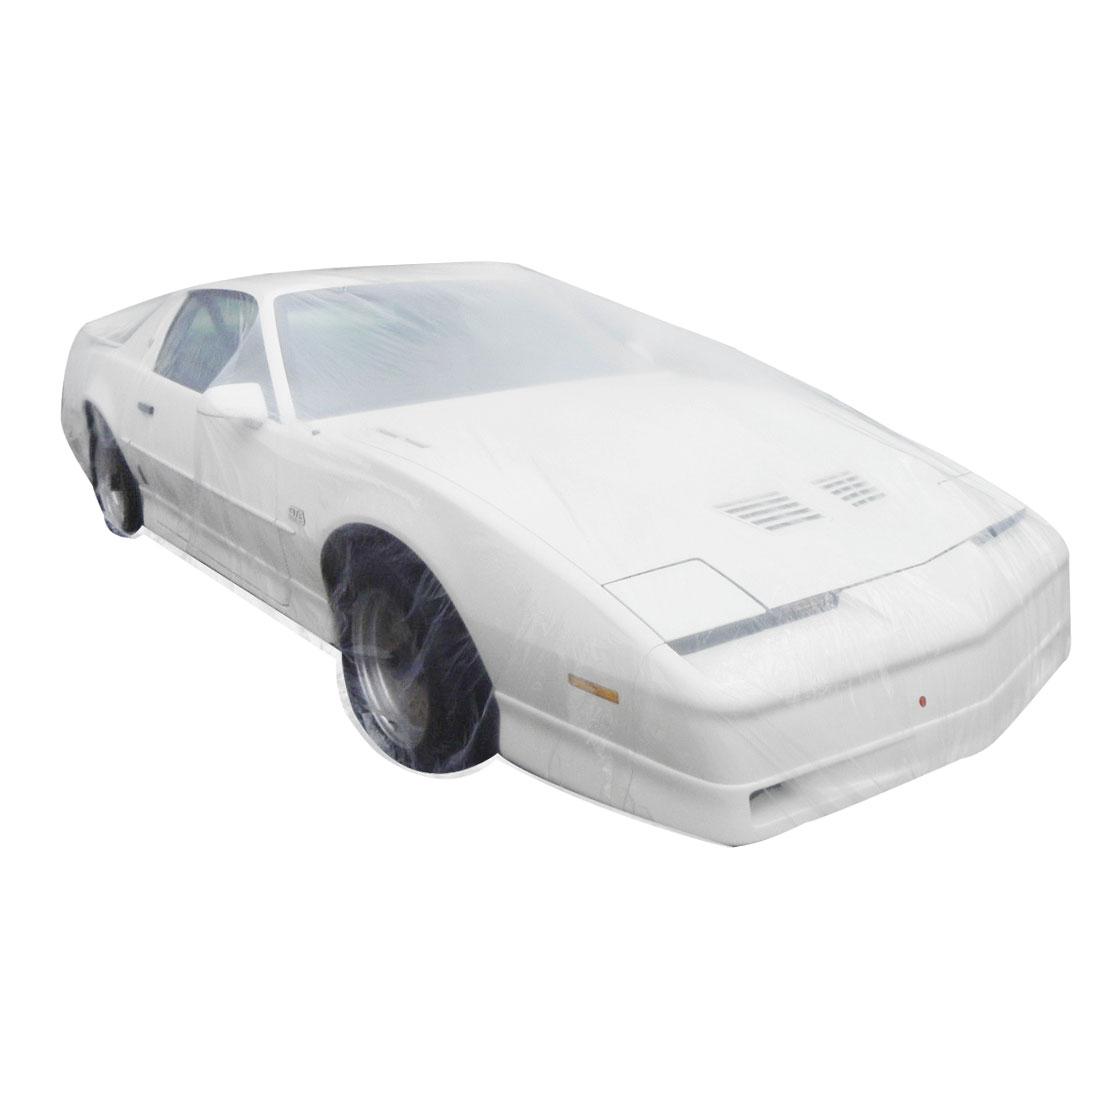 Clear Plastic Temporary Universal Disposable Car Cover Rain Dust Garage M